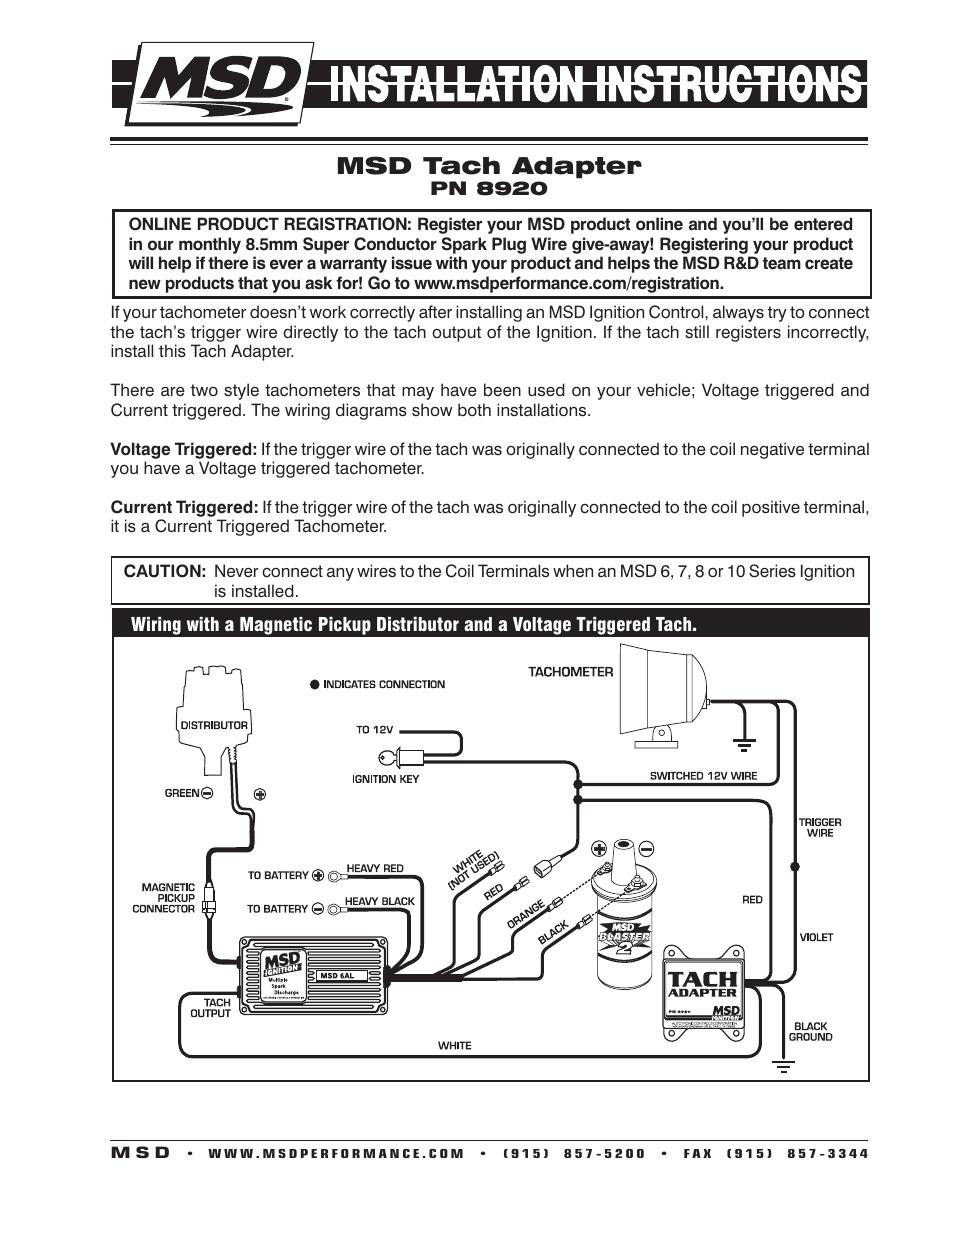 Wrg 4083 Auto Meter Tach Wiring Diagram Hei